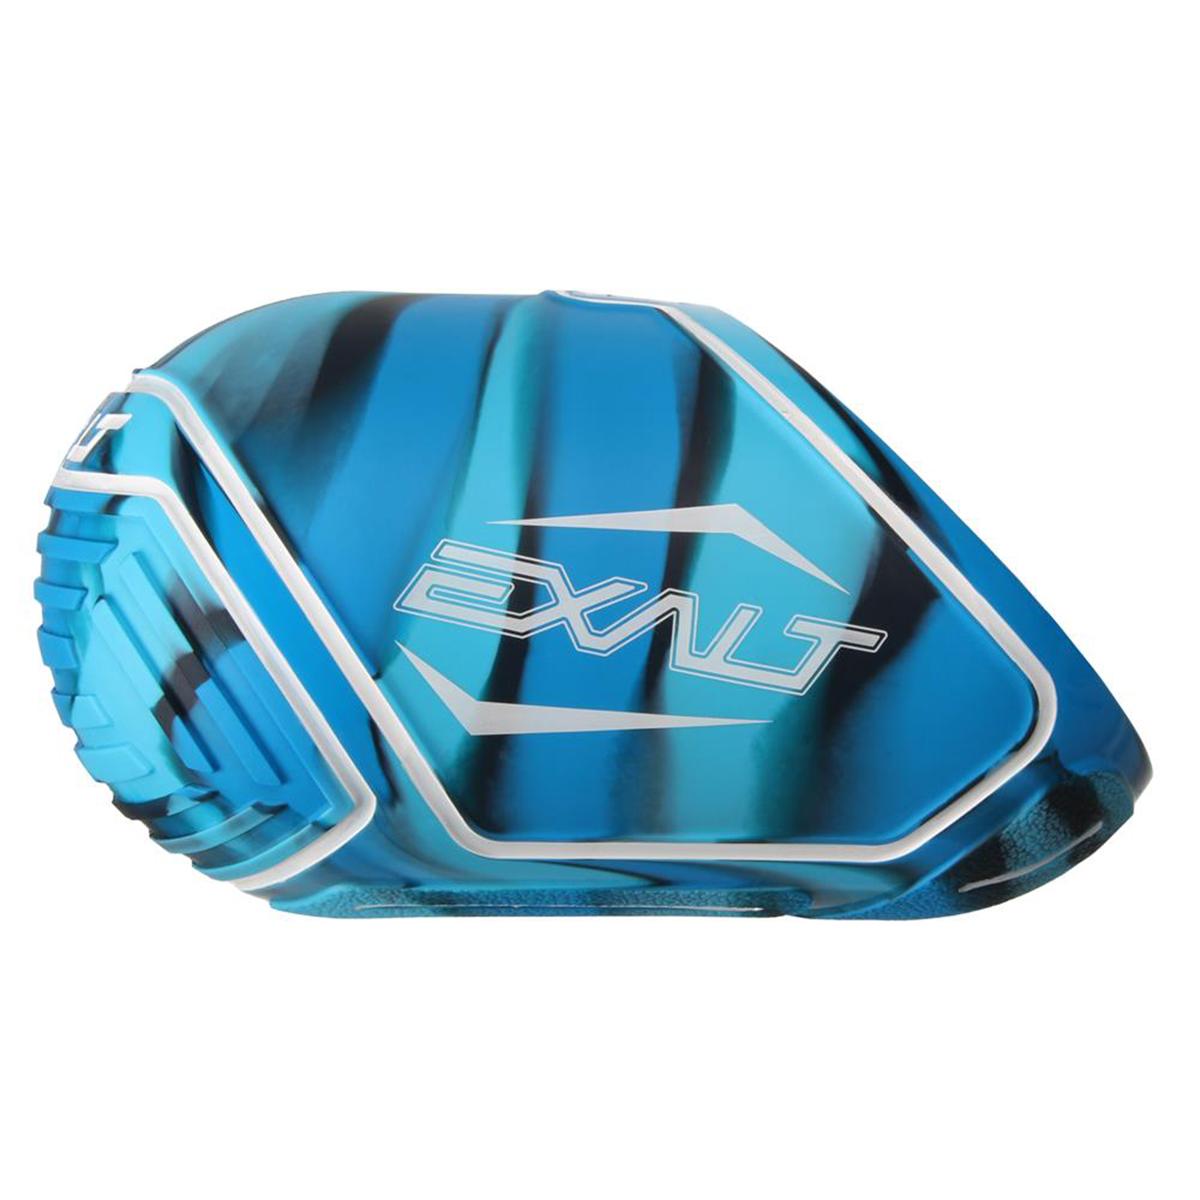 exalt paintball tank cover small 45 50ci blue swirl